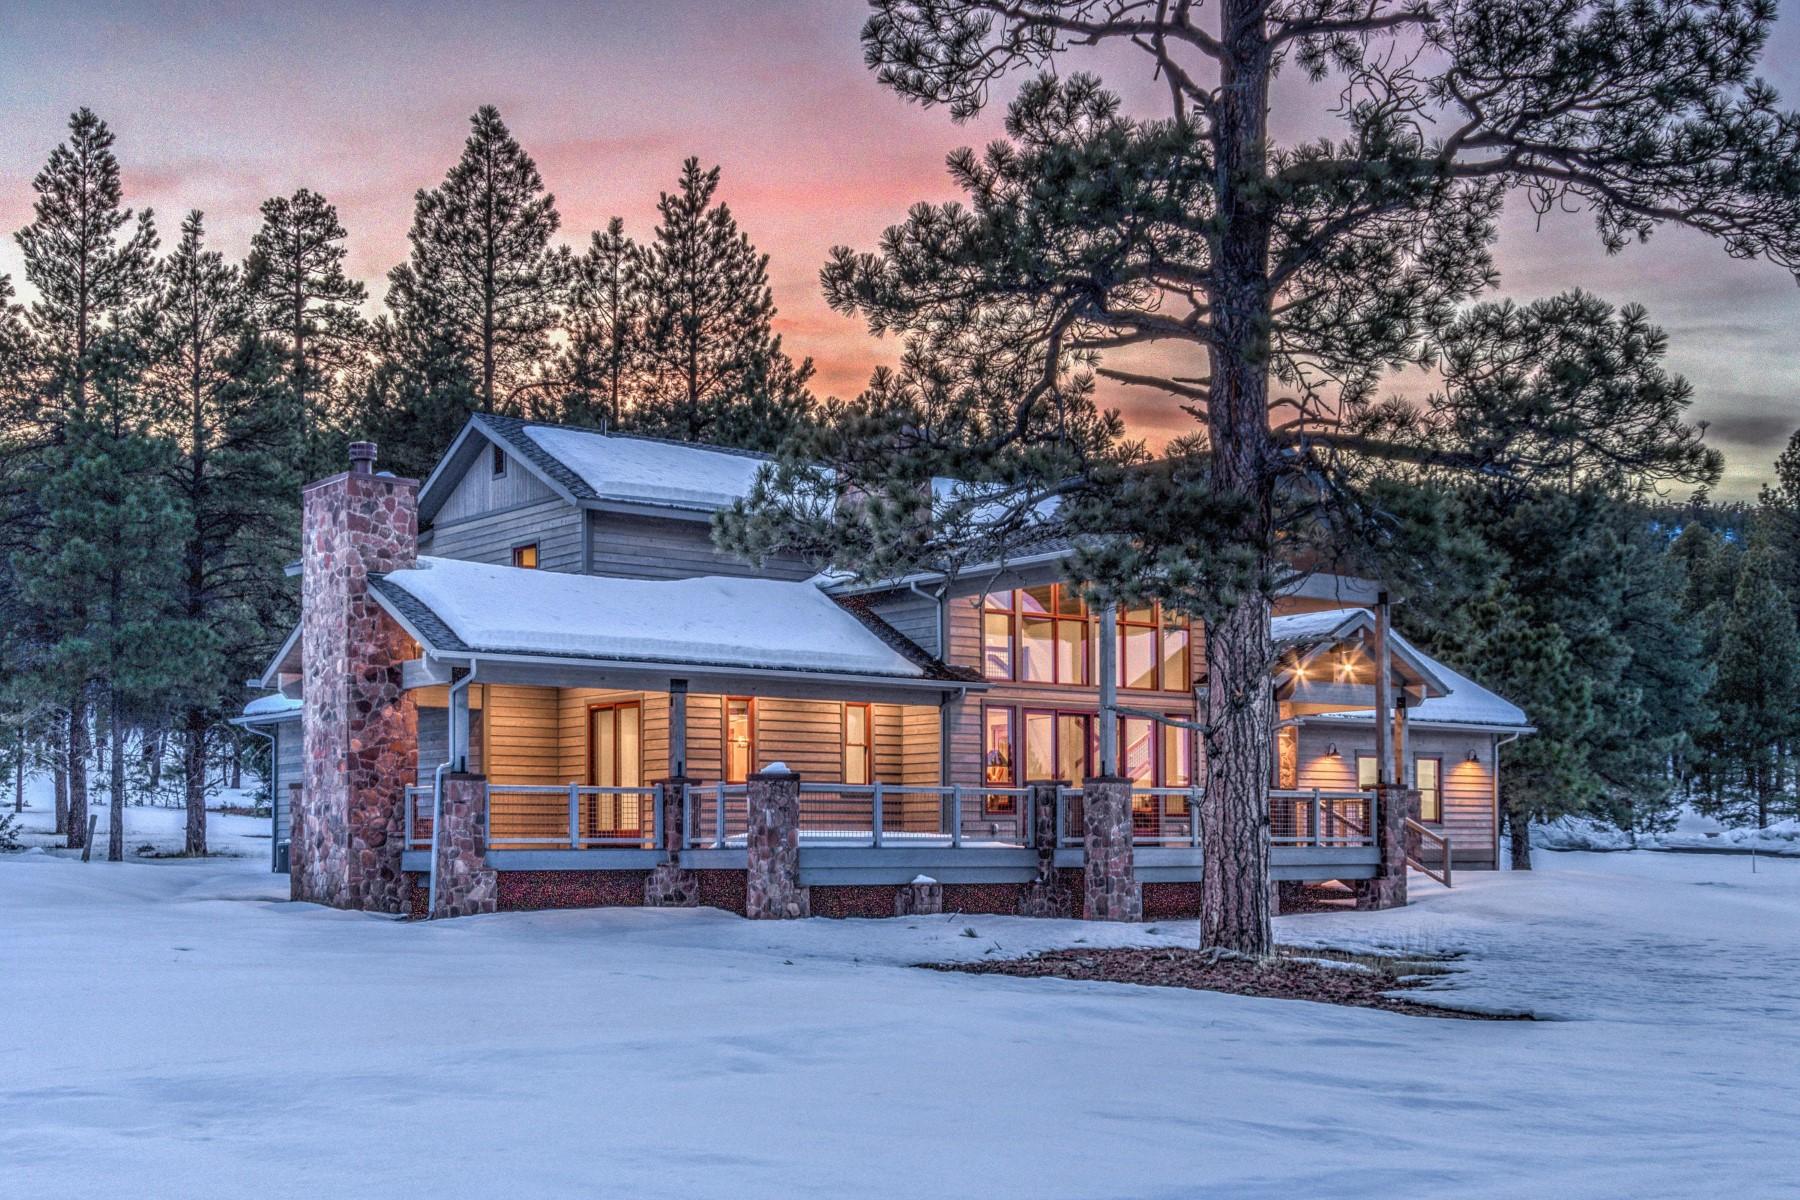 Single Family Homes for Sale at Foxboro Ranch Estates 236 W Dawn CIR Munds Park, Arizona 86017 United States